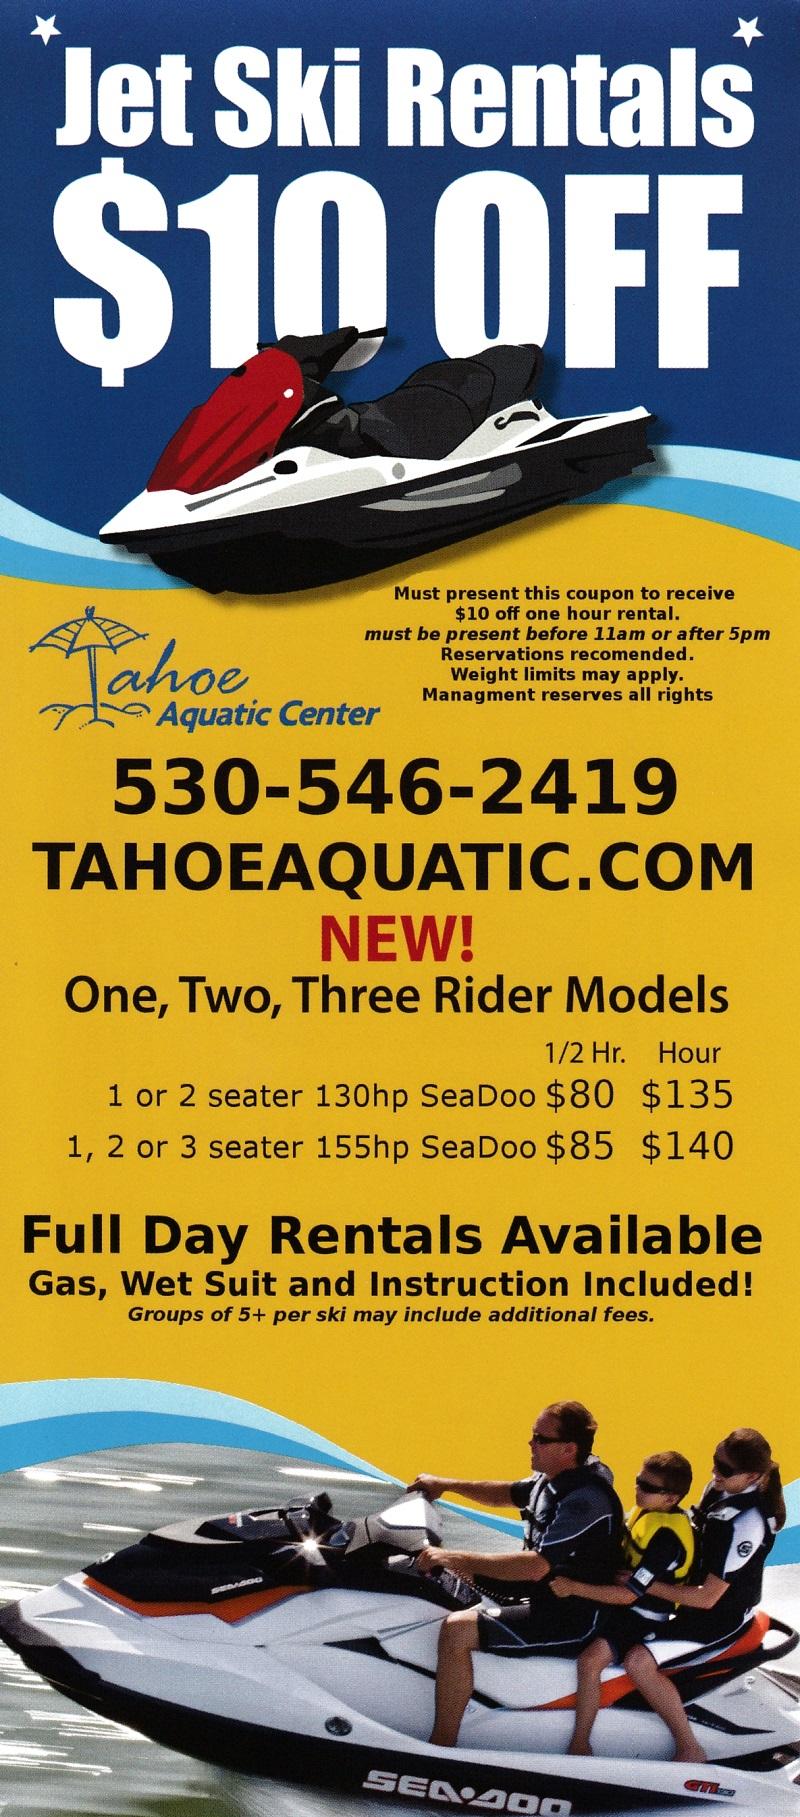 Tahoe Aquatic Center/Jet Skis